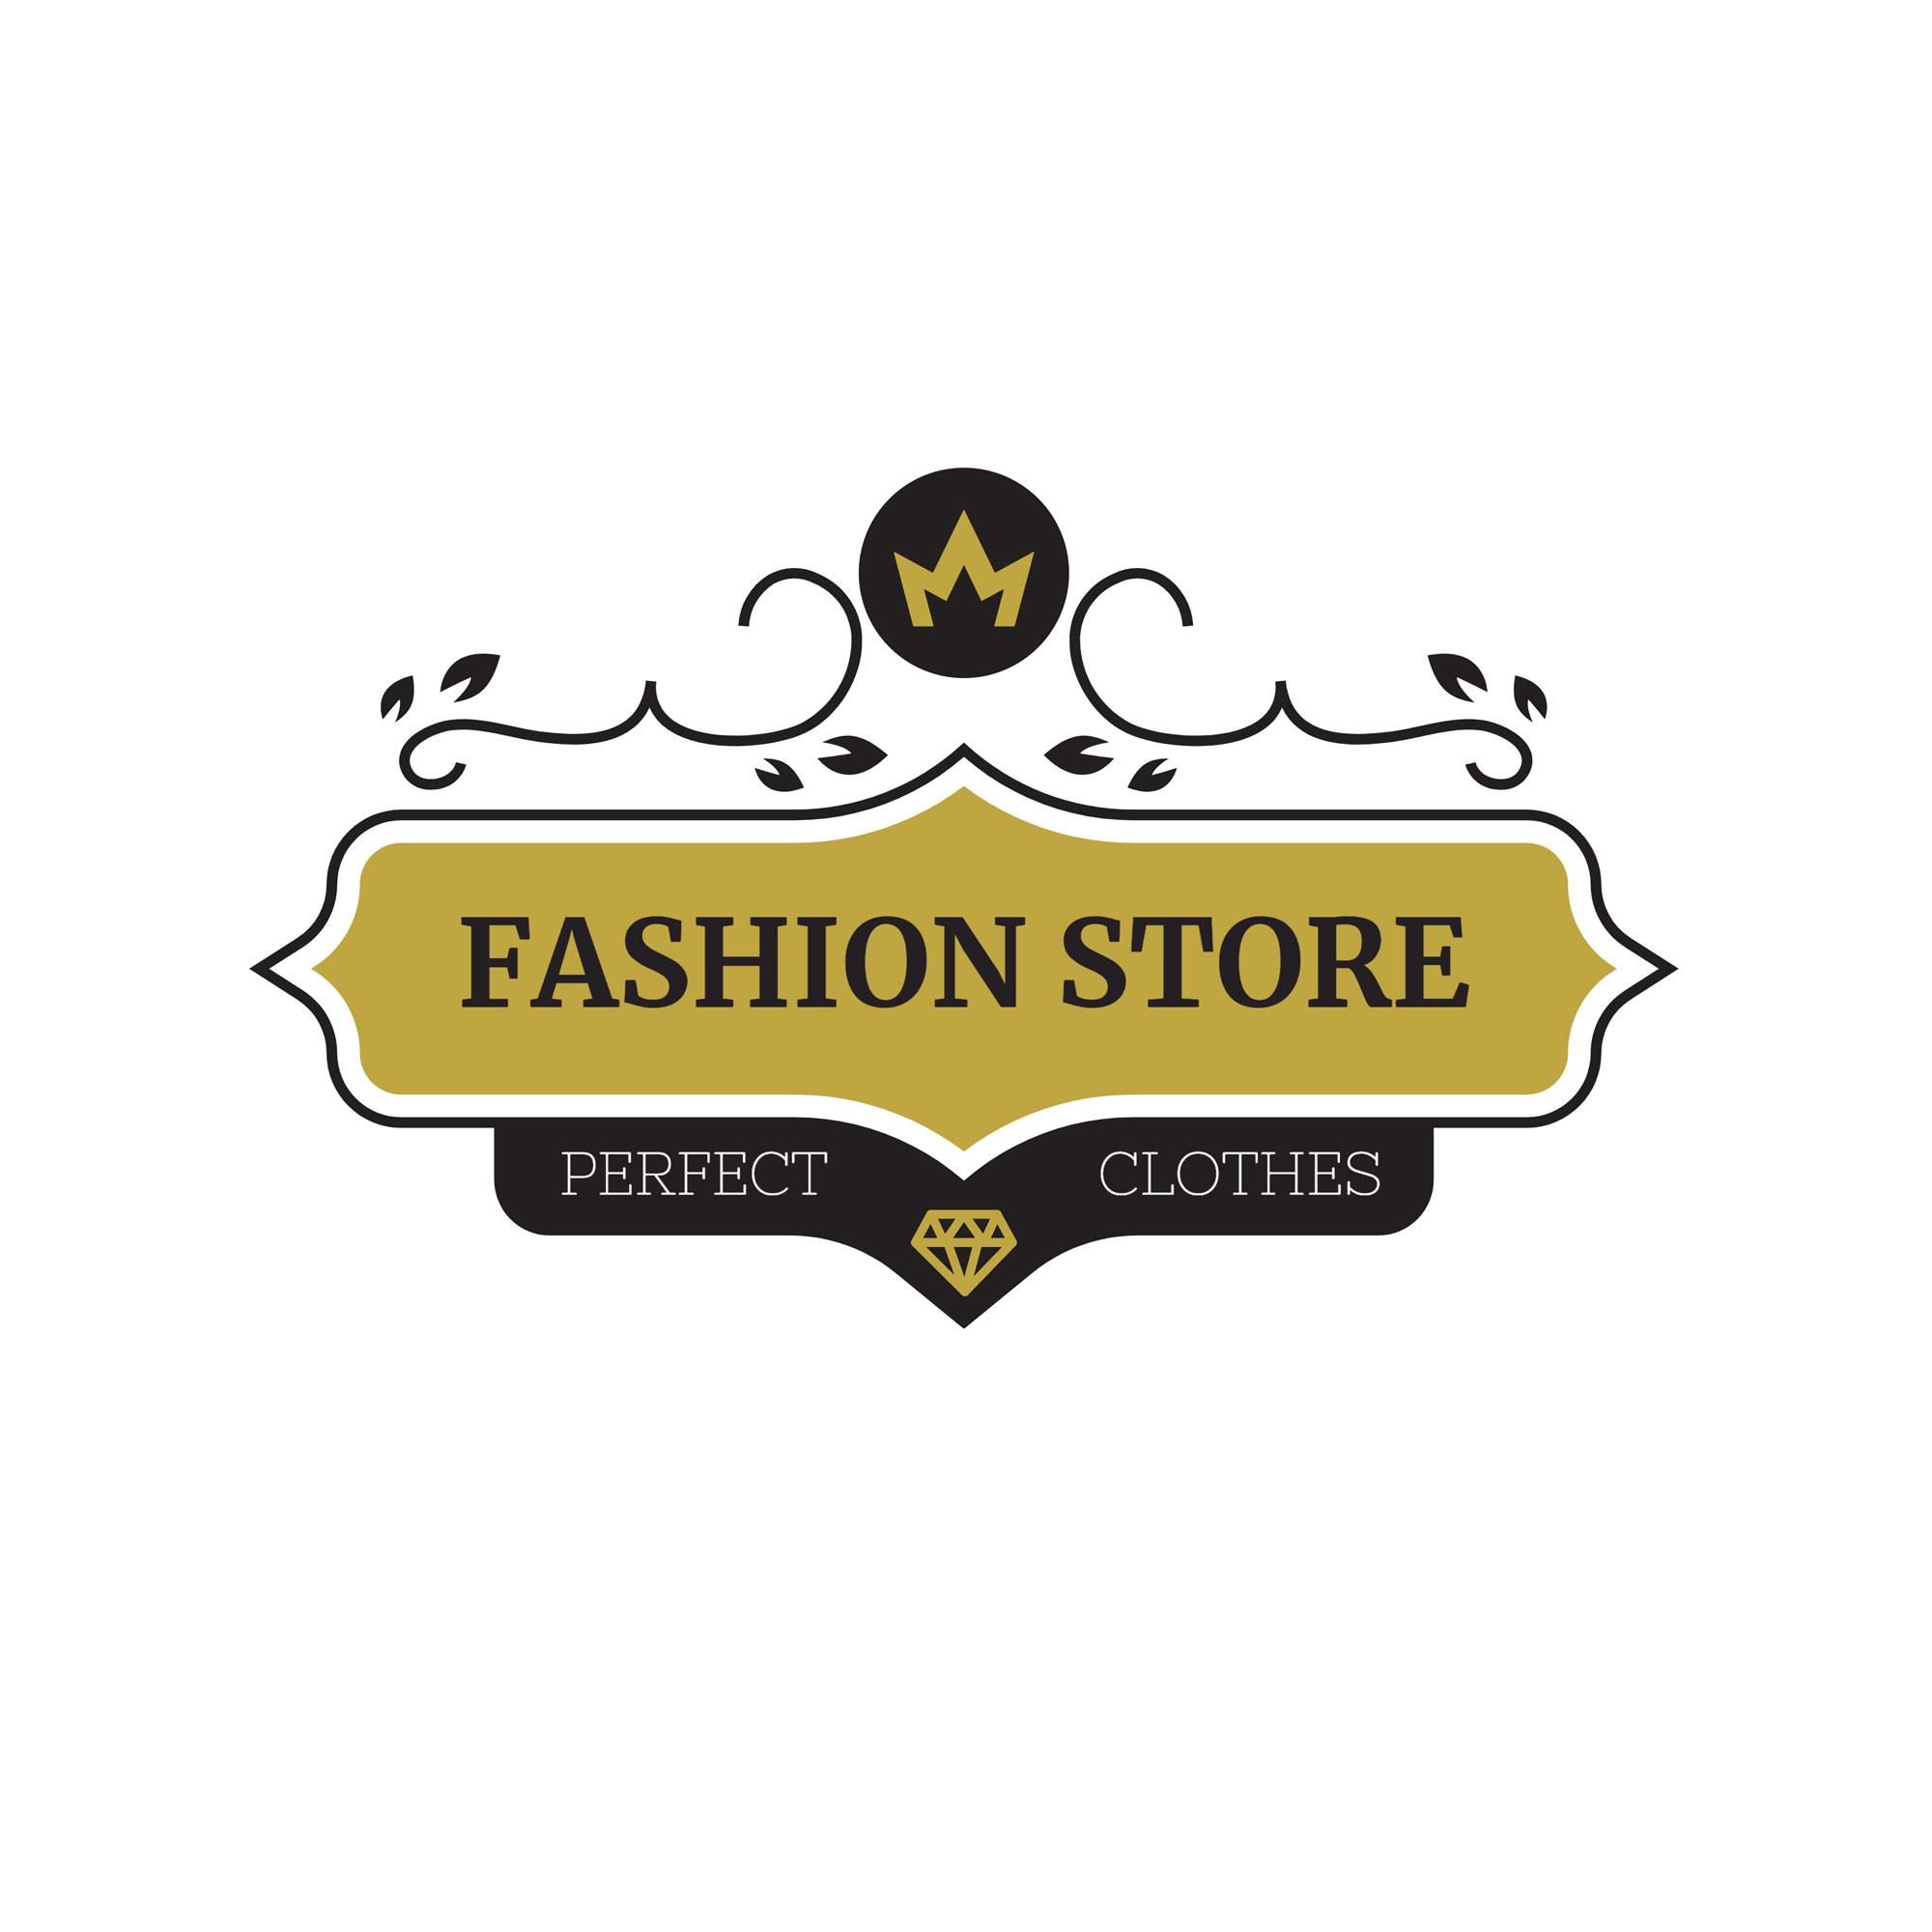 Perfect Fashion Store Logos Template Vl004.